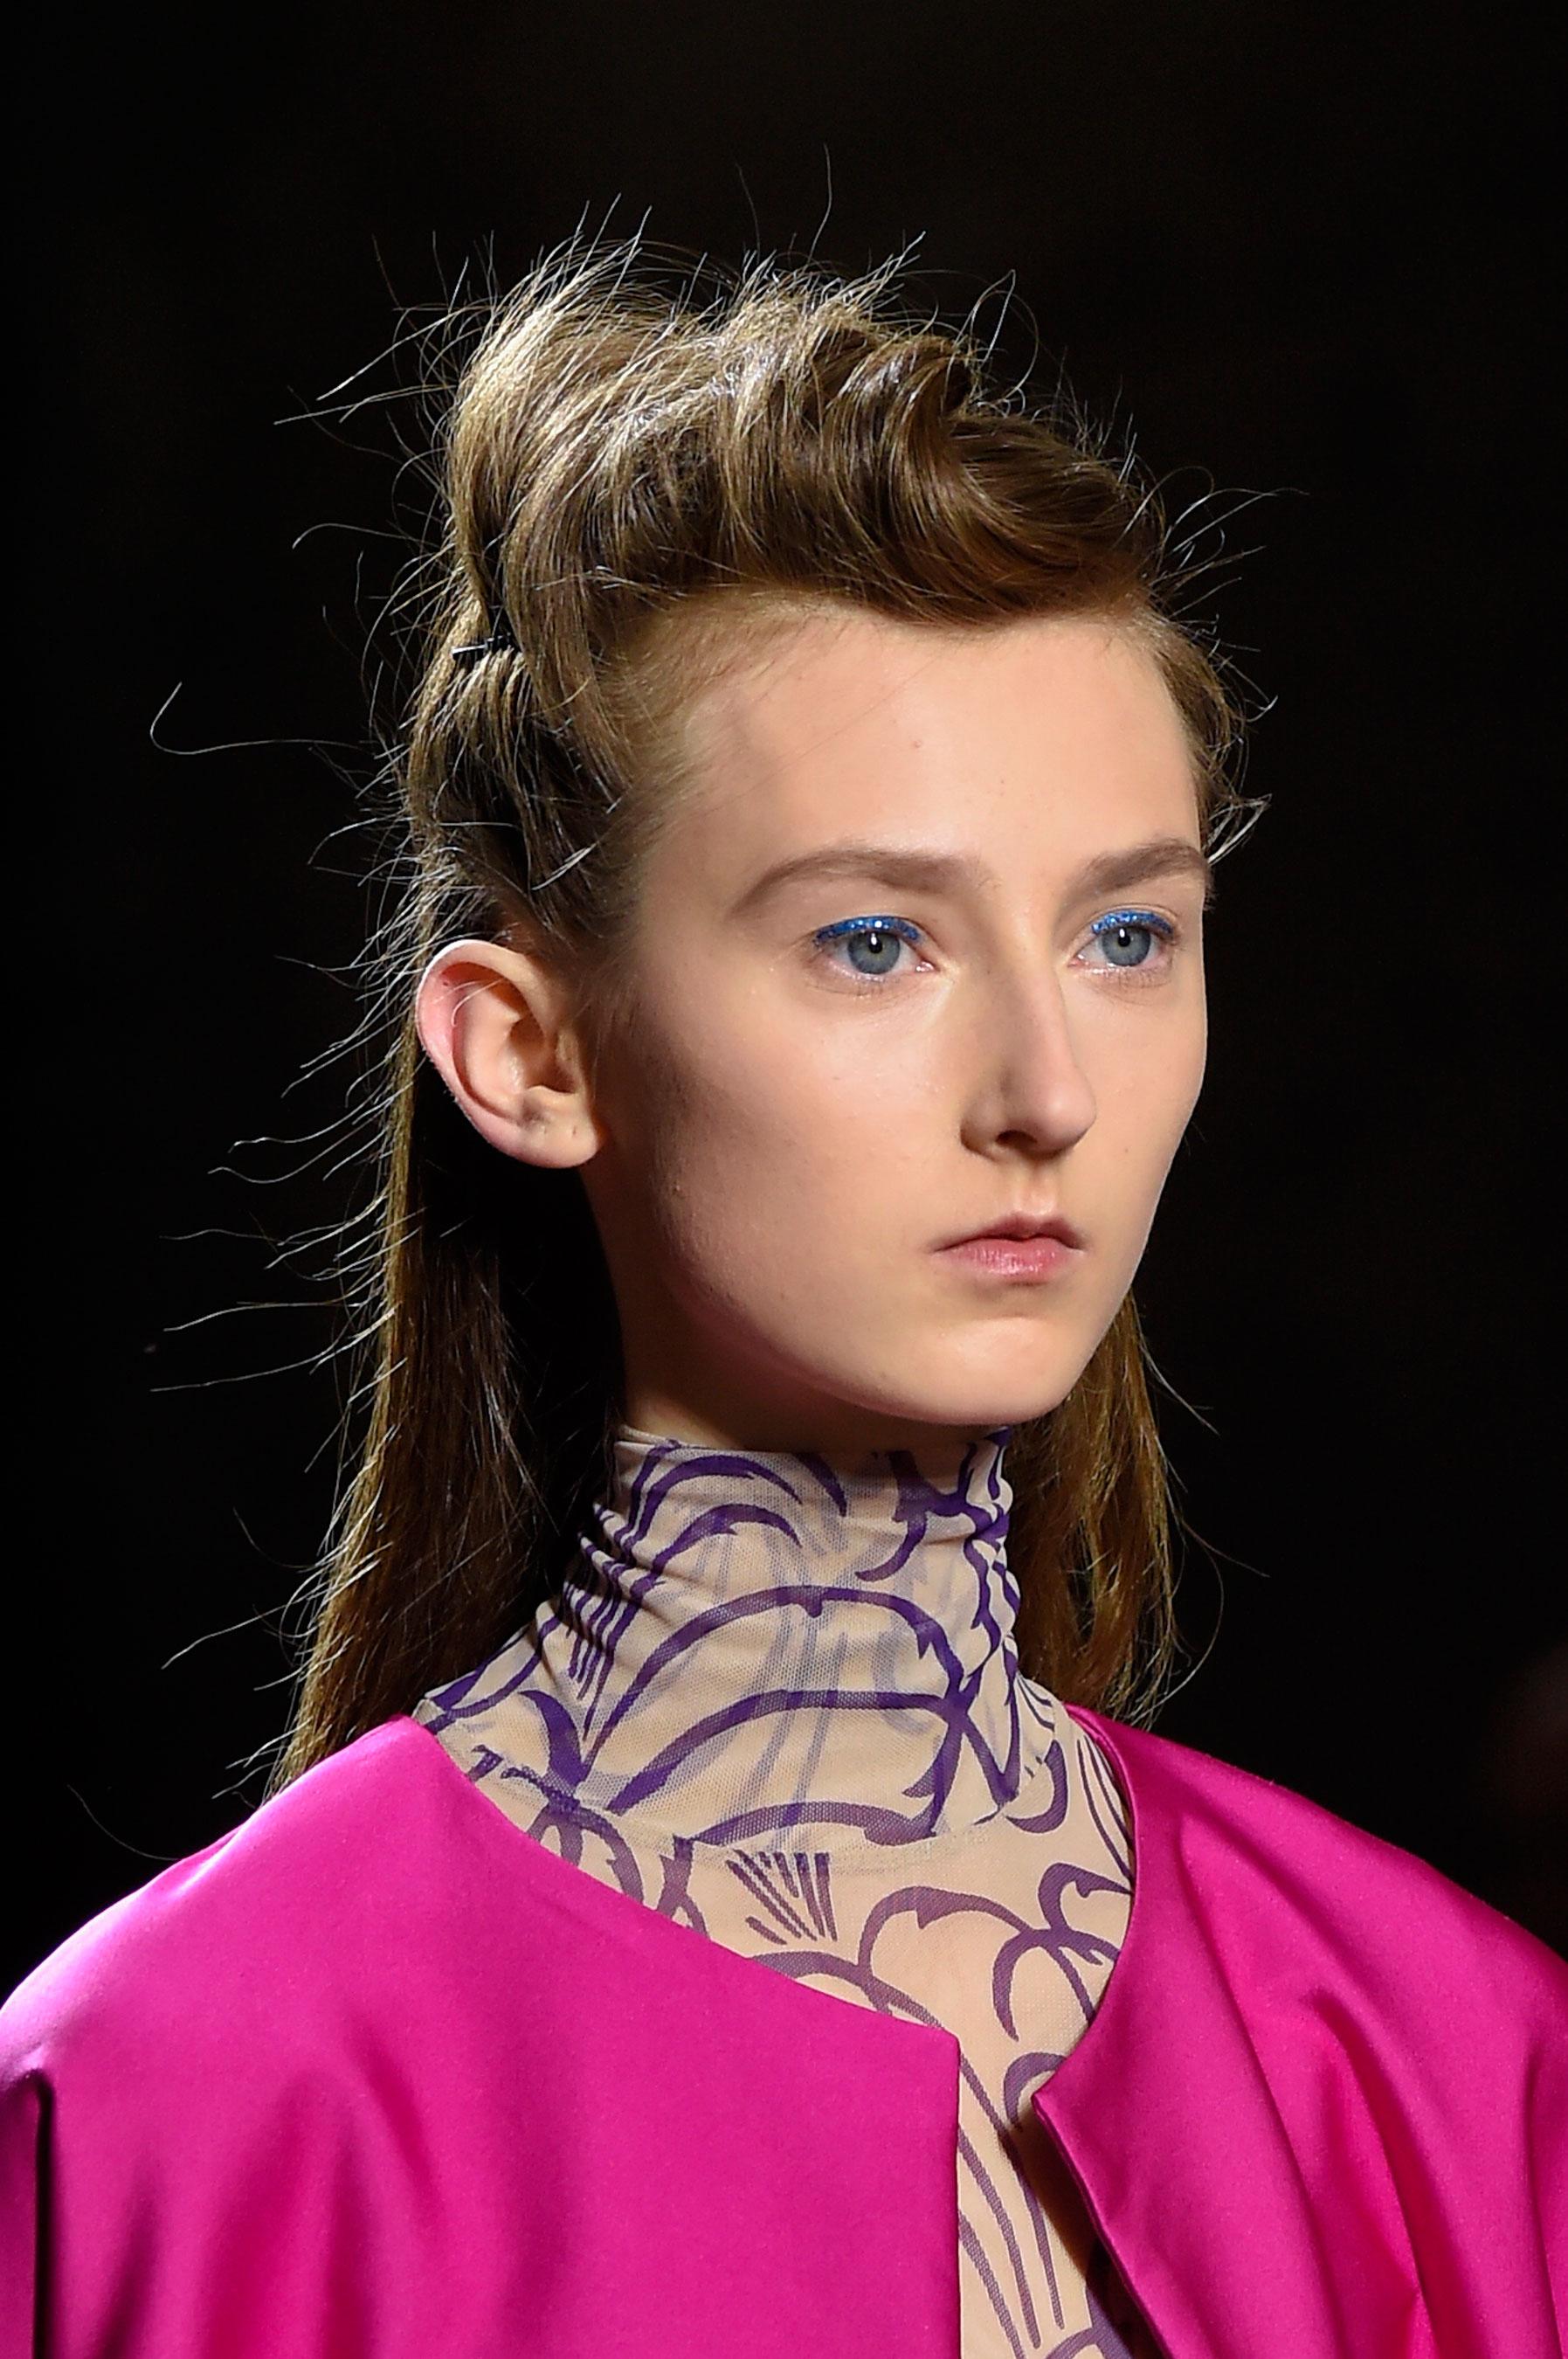 Dries-van-Noten-spring-2016-runway-beauty-fashion-show-the-impression-05